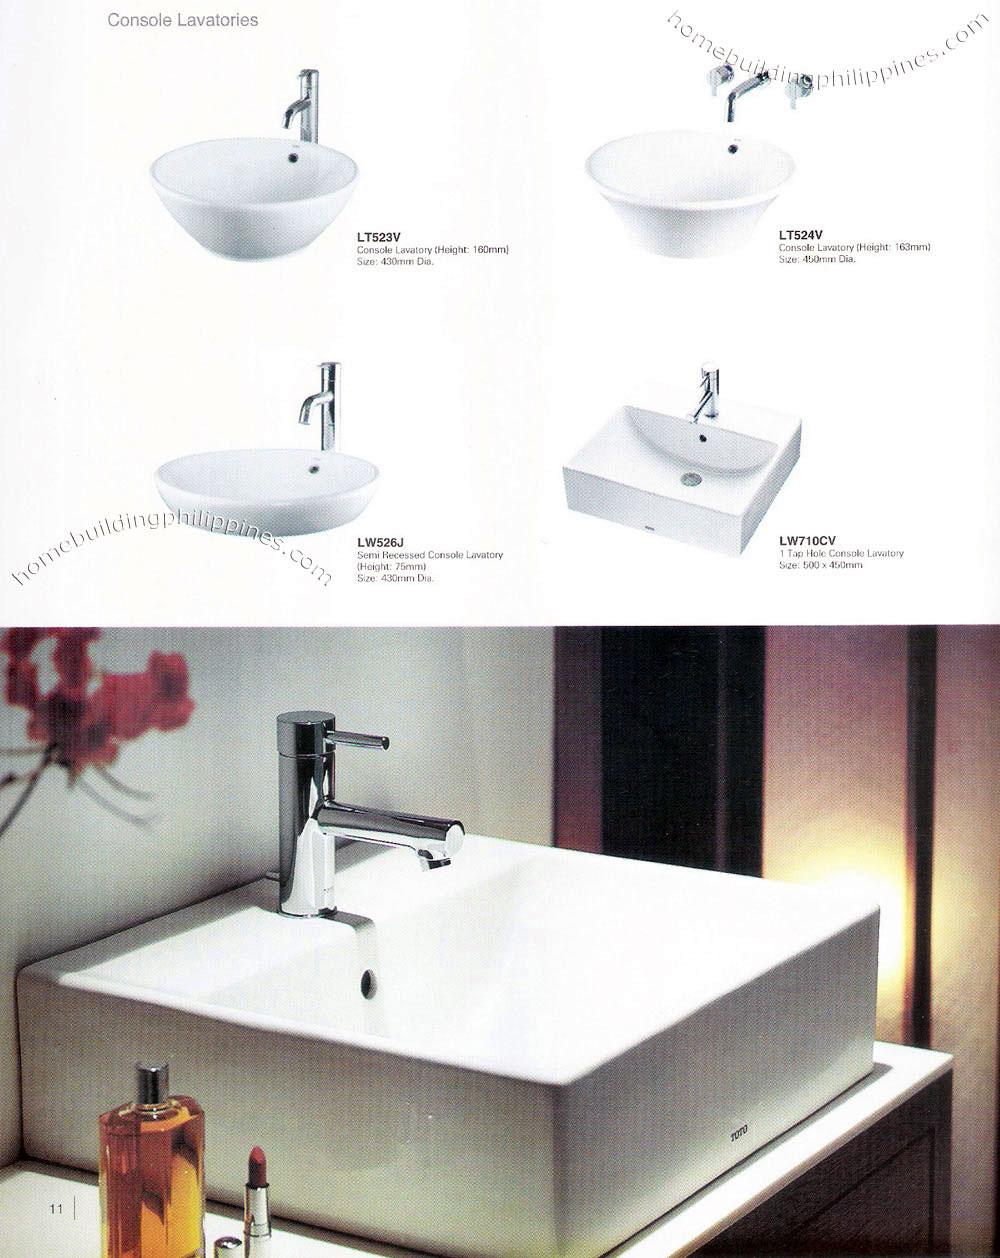 Bathroom Console Lavatories; Wash Basin Design Philippines